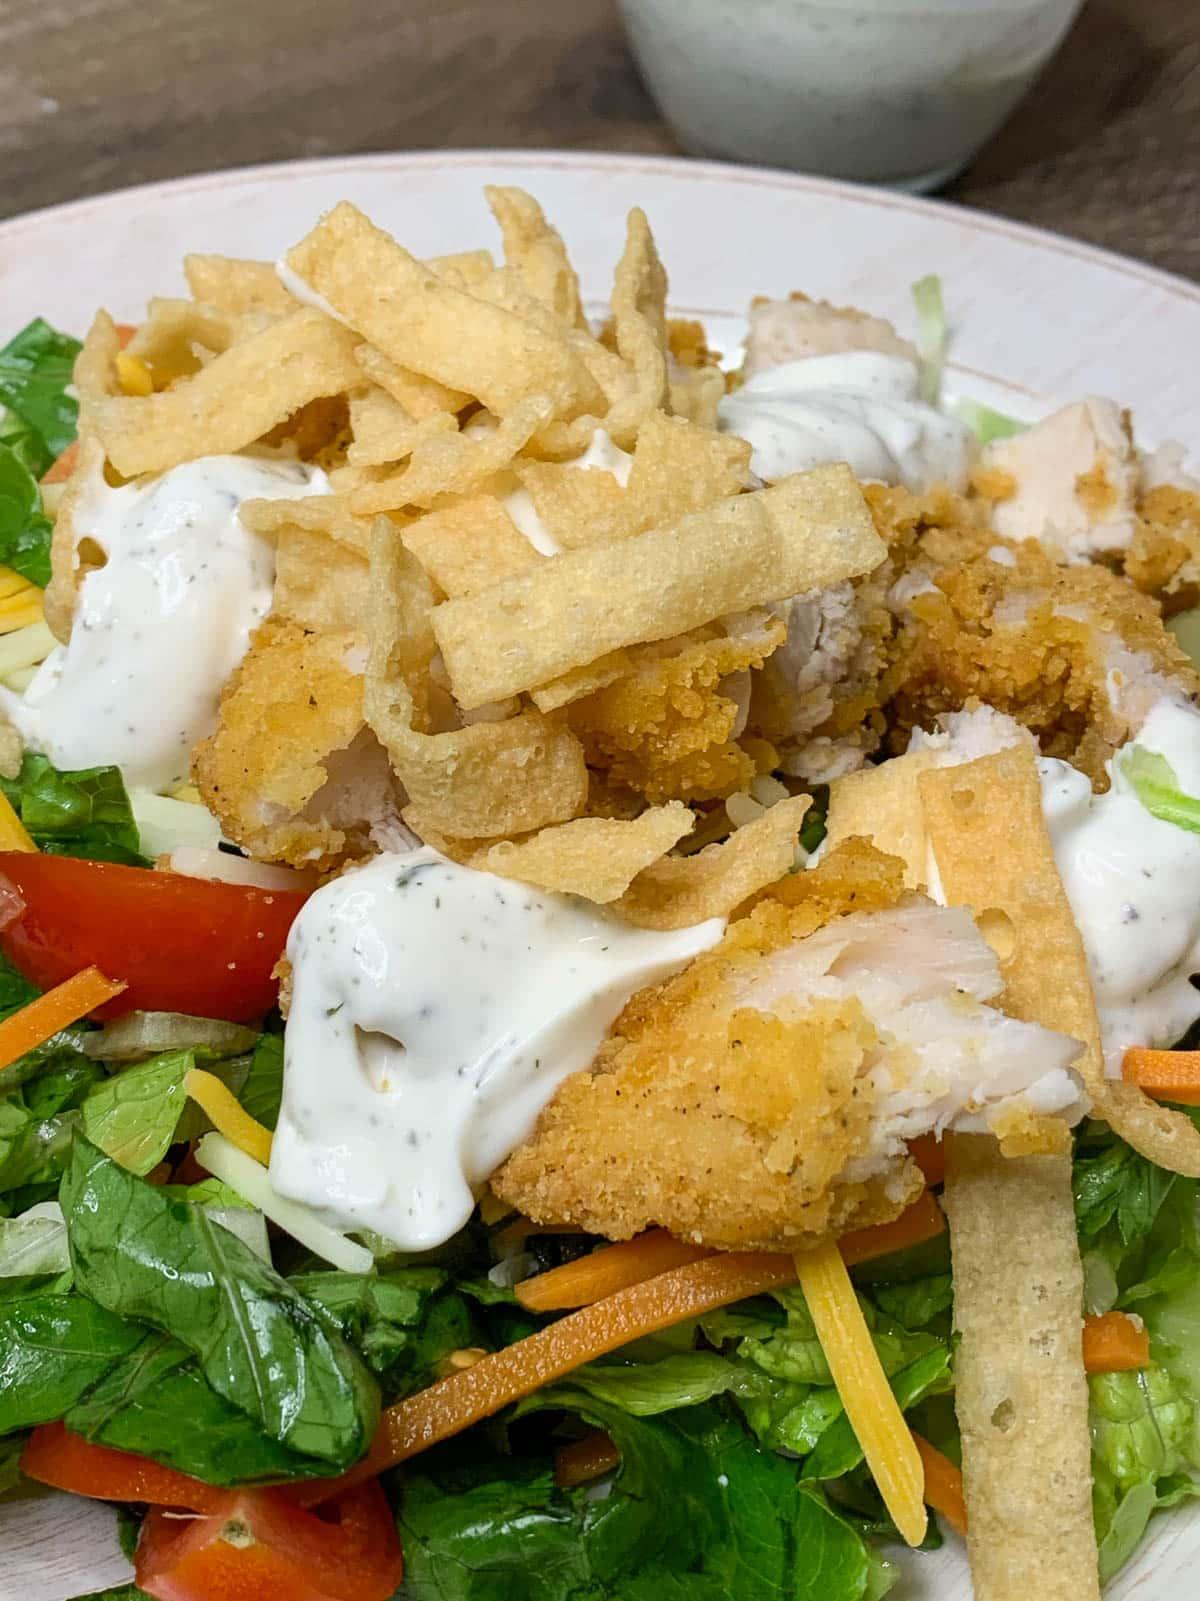 ranch sauce on salad